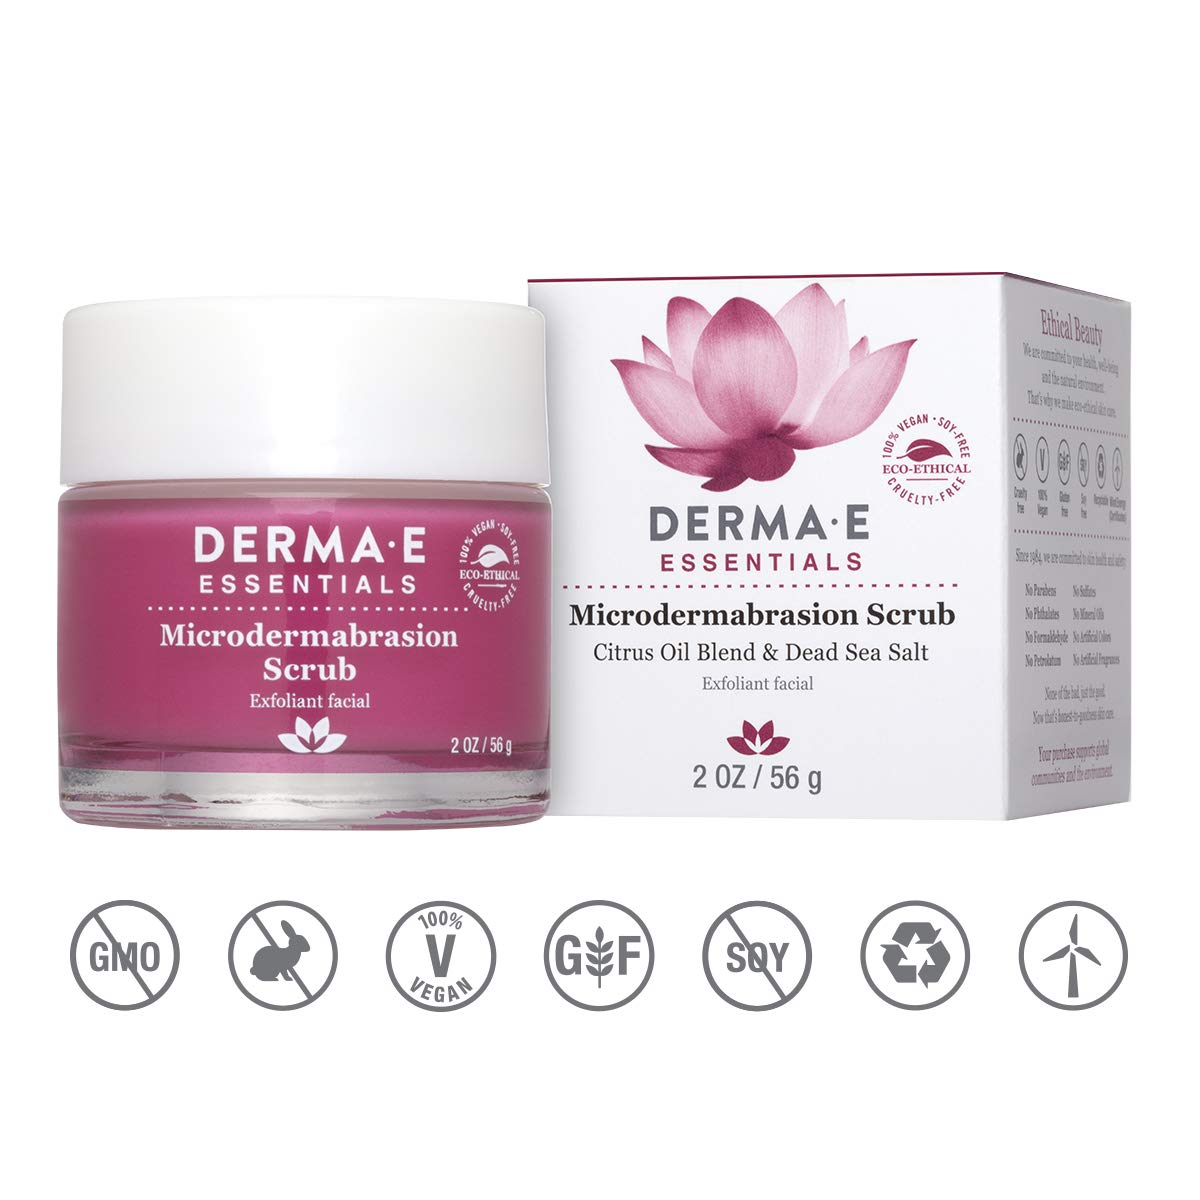 DERMA E Microdermabrasion Dead Sea Salt Scrub, 2oz by derma e